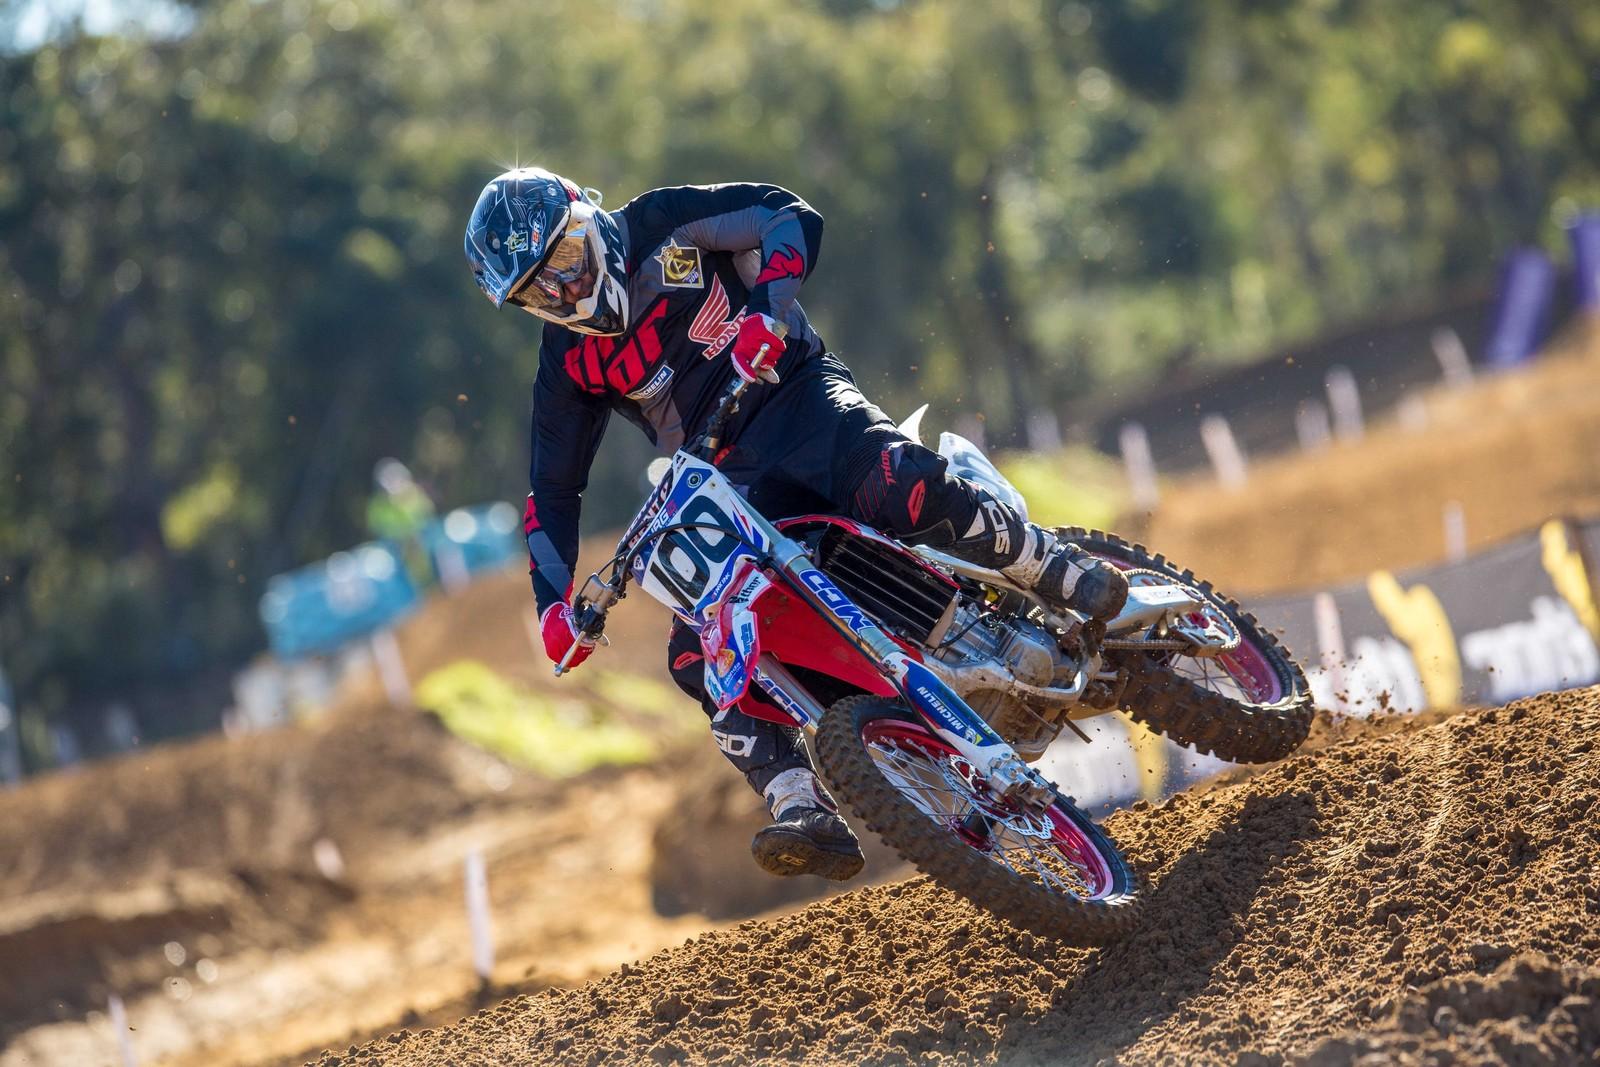 Craig Anderson - Australian Motul MX Championships: Round 6, Nowra - Motocross Pictures - Vital MX